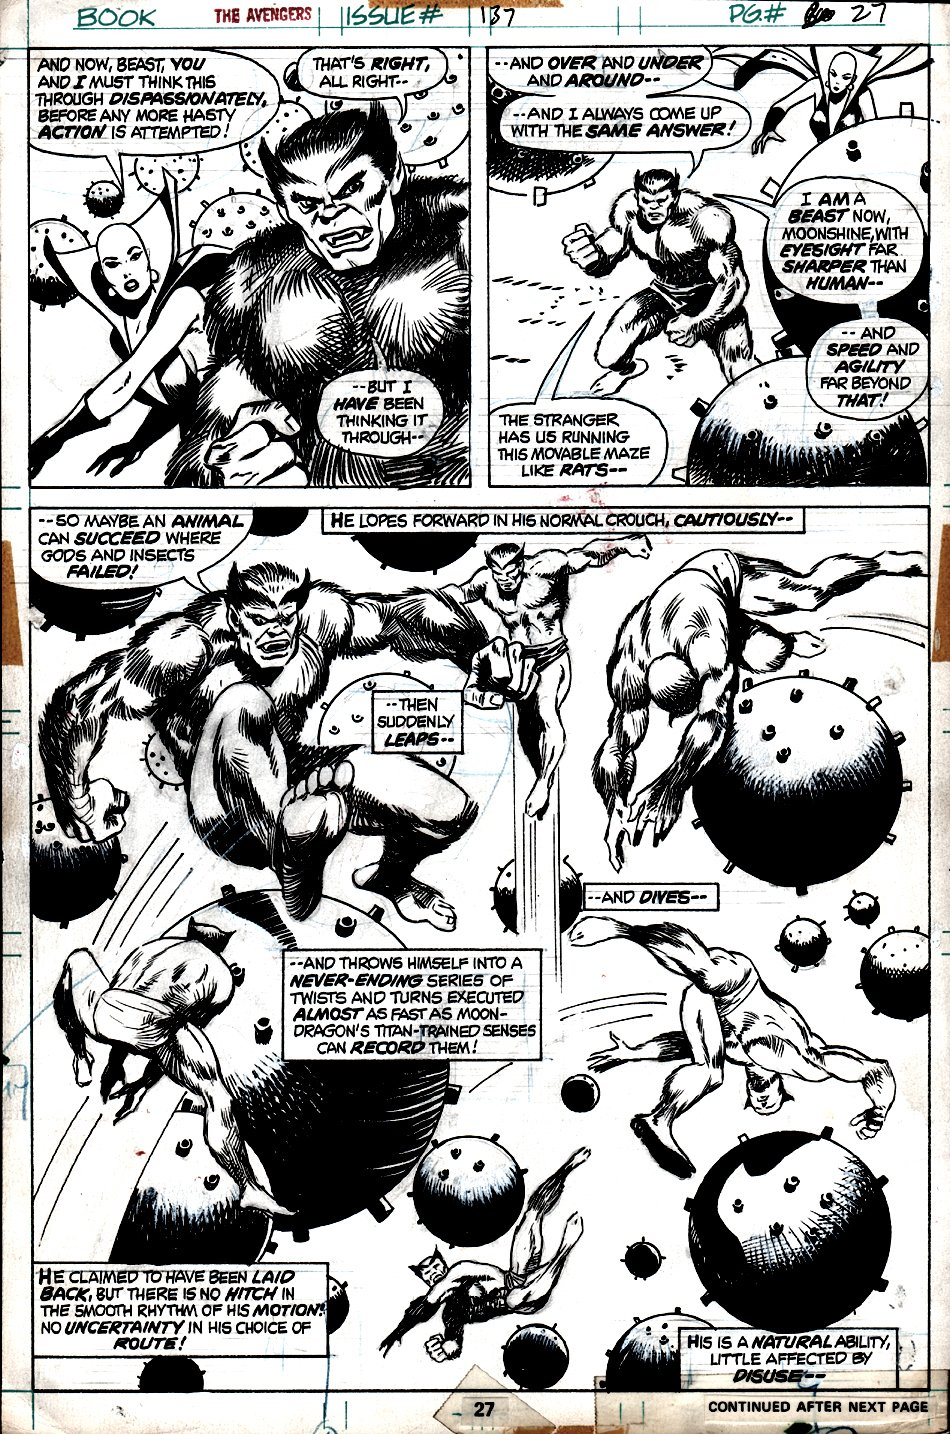 Avengers #137 p 27 SPLASH (AWESOME 'BEAST' COLLAGE BATTLE!) 1975